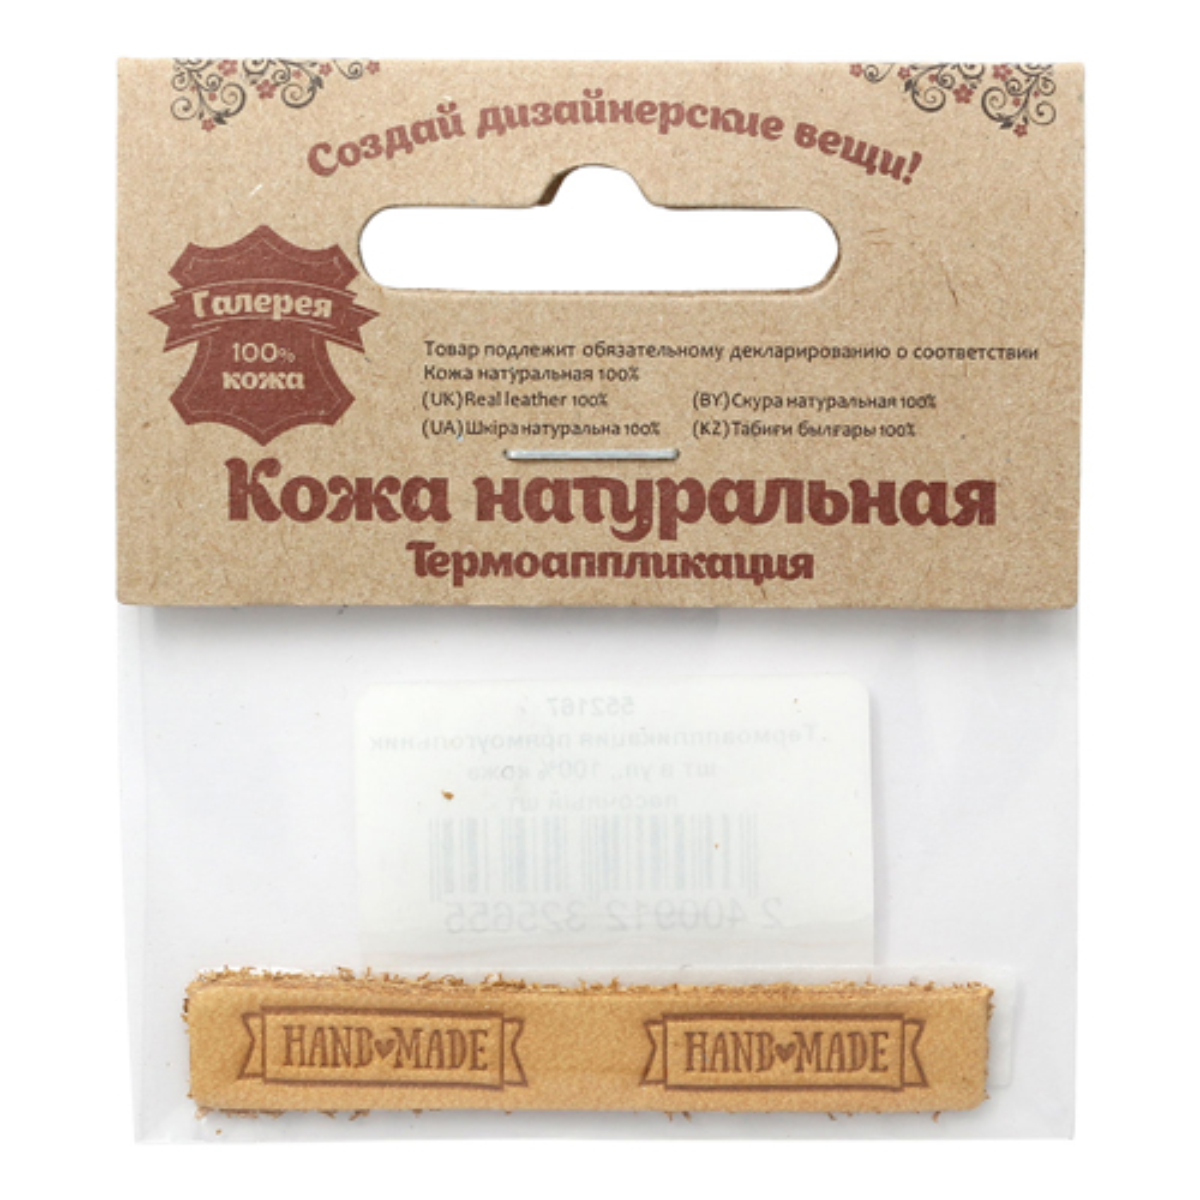 12 Термоаппликация из кожи Hand Made 6*0,9см, 100% кожа